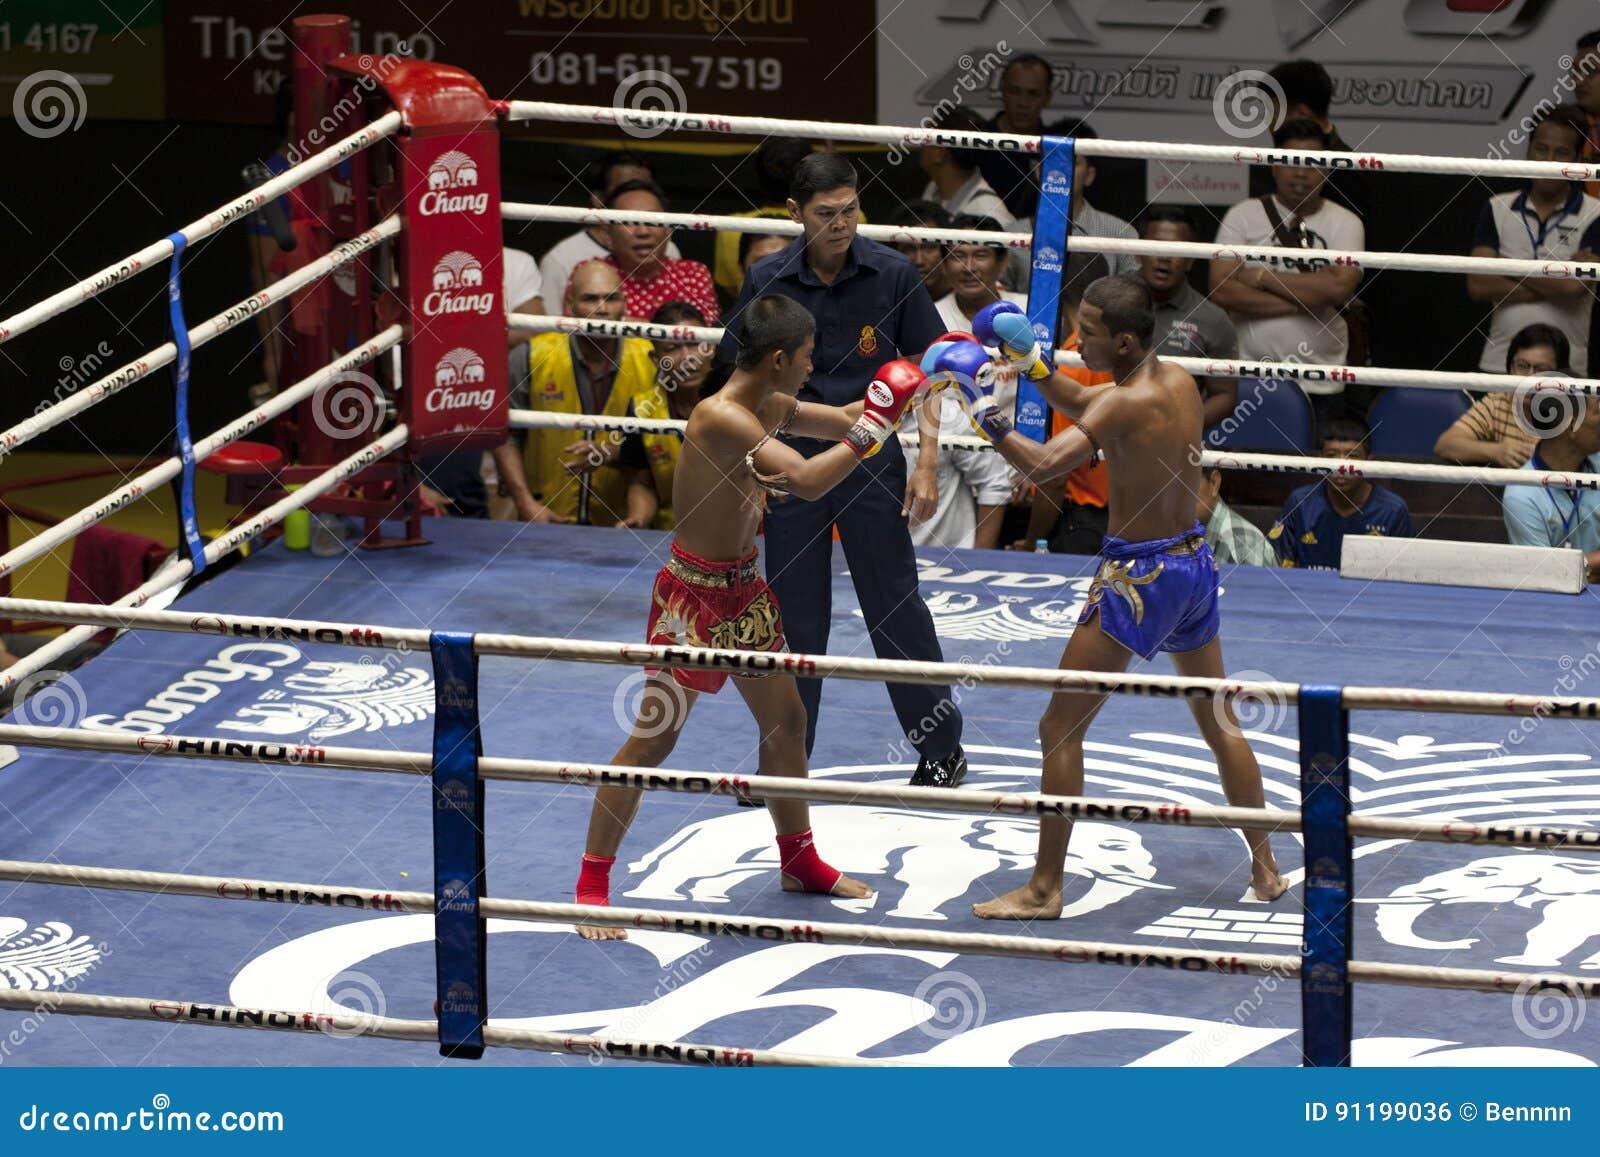 muay thai boxing in thailand